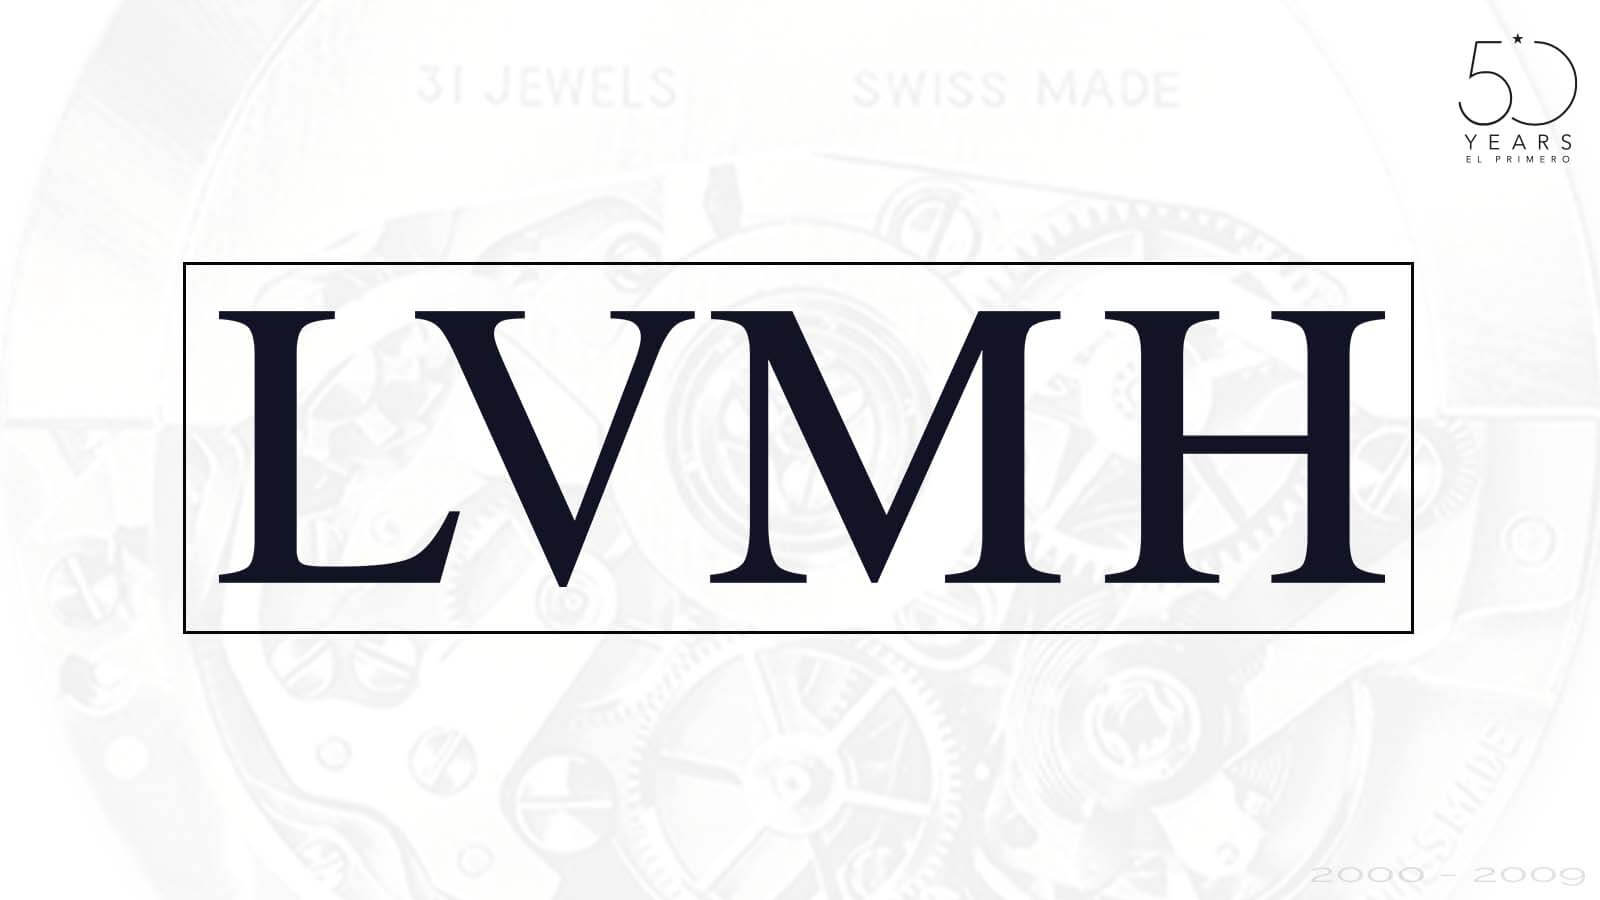 Louis Vuitton Moët Hennessy Logo